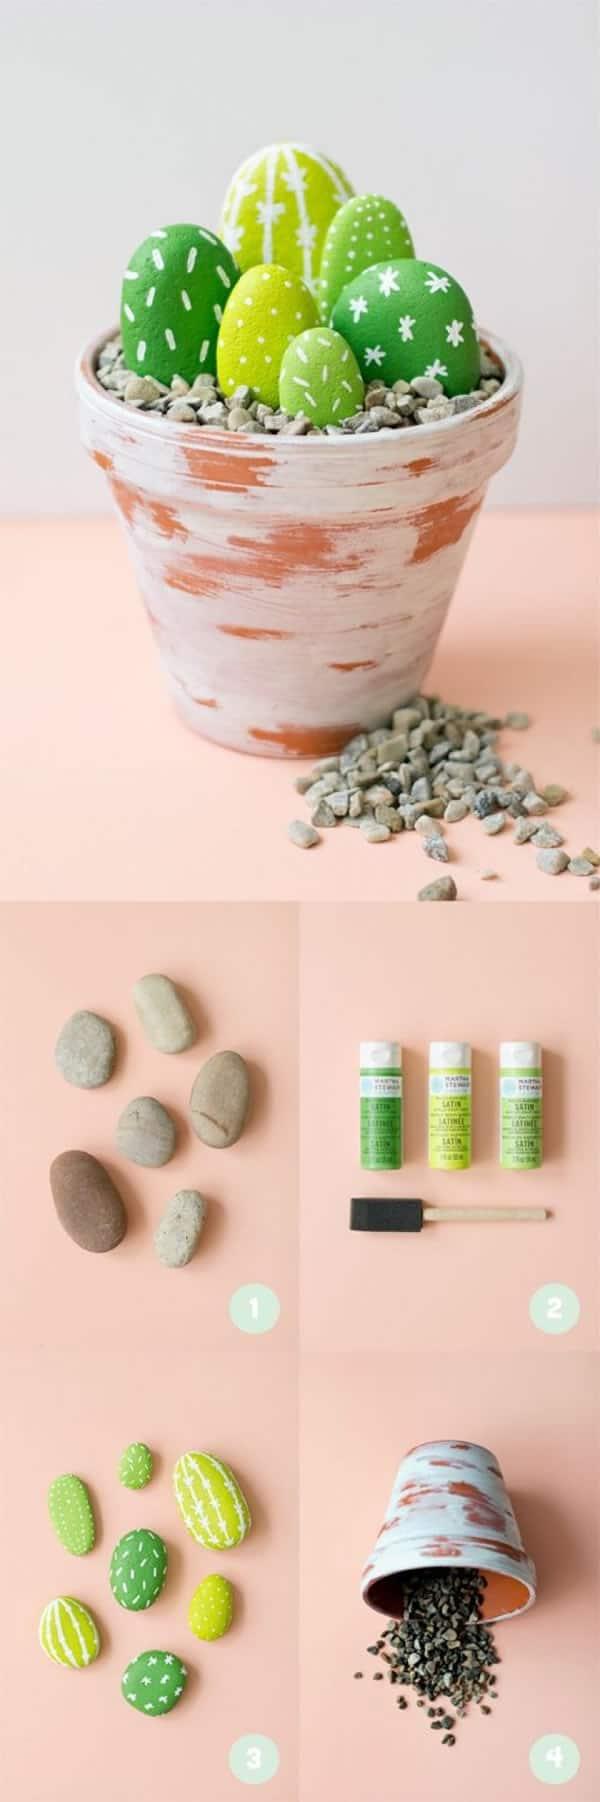 Eggs-cellent and DIY-rock-cactus